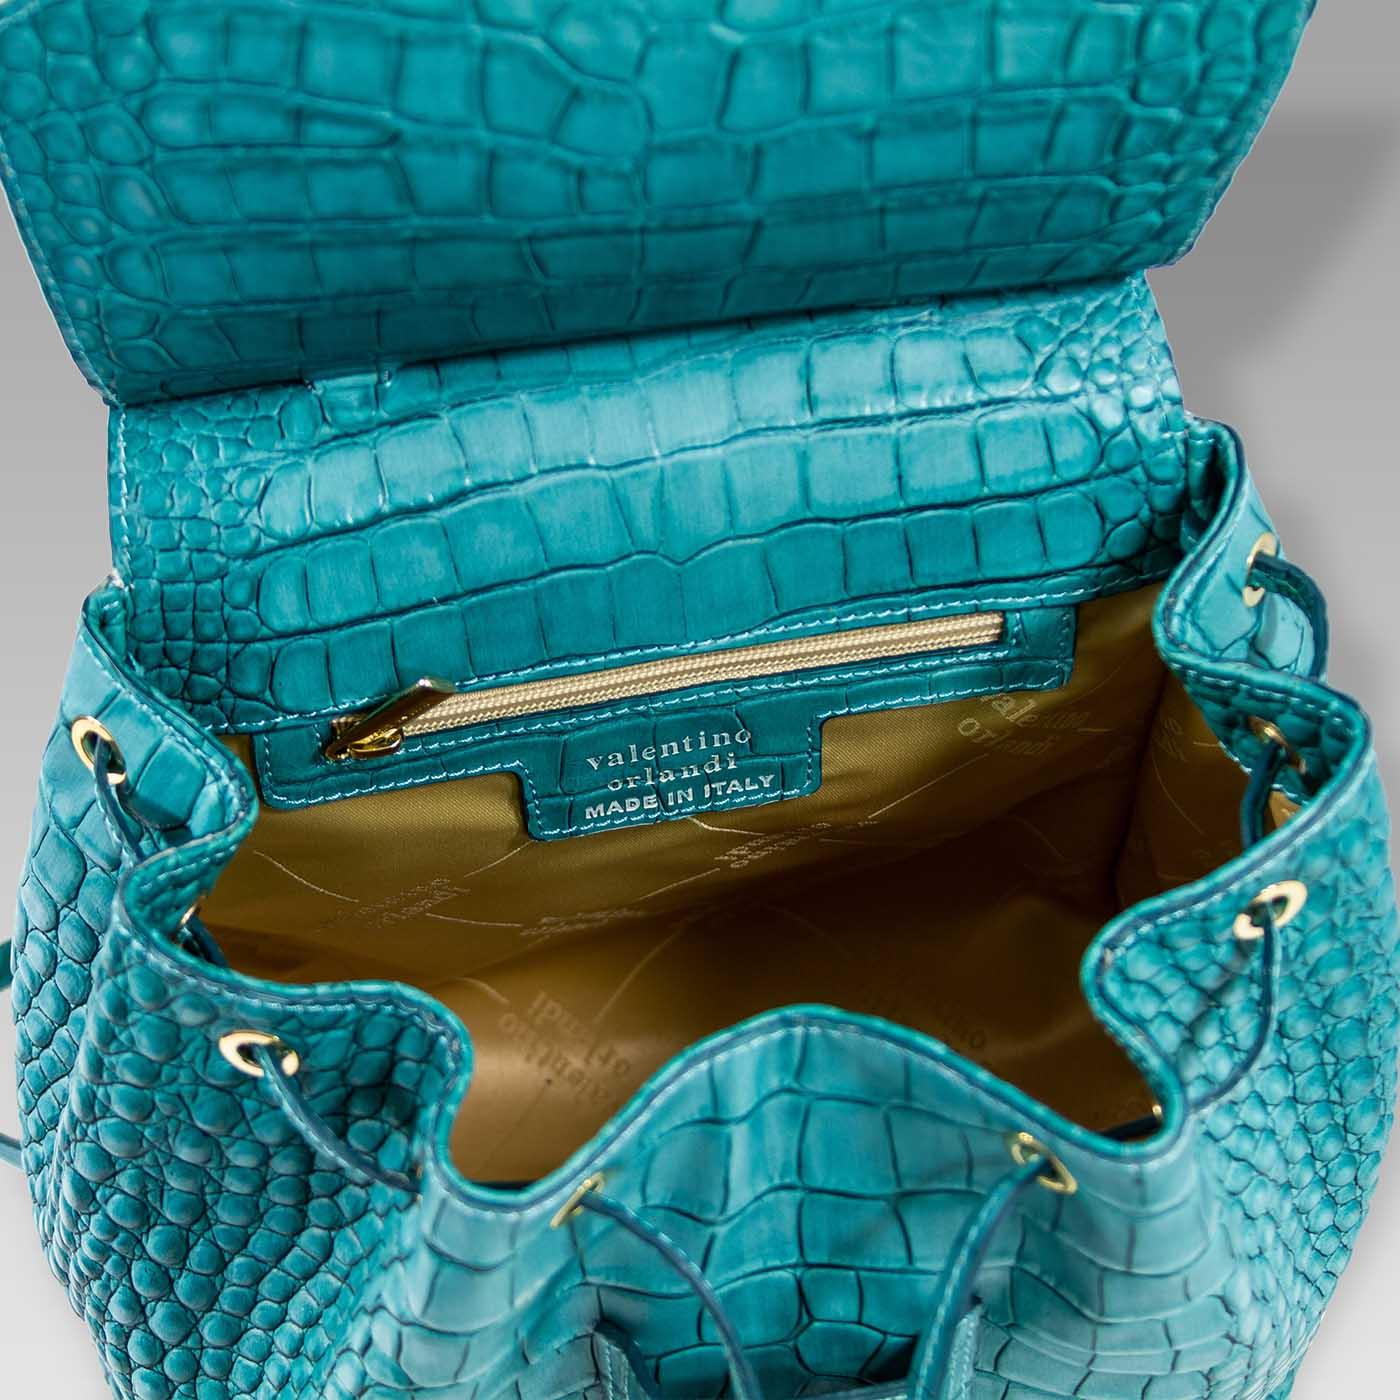 Valentino_Orlandi_Backpack_Deco_Blue_Croc_Embossed_Leather_Bucket_Bag_01VO41989CLAQ_04.jpg